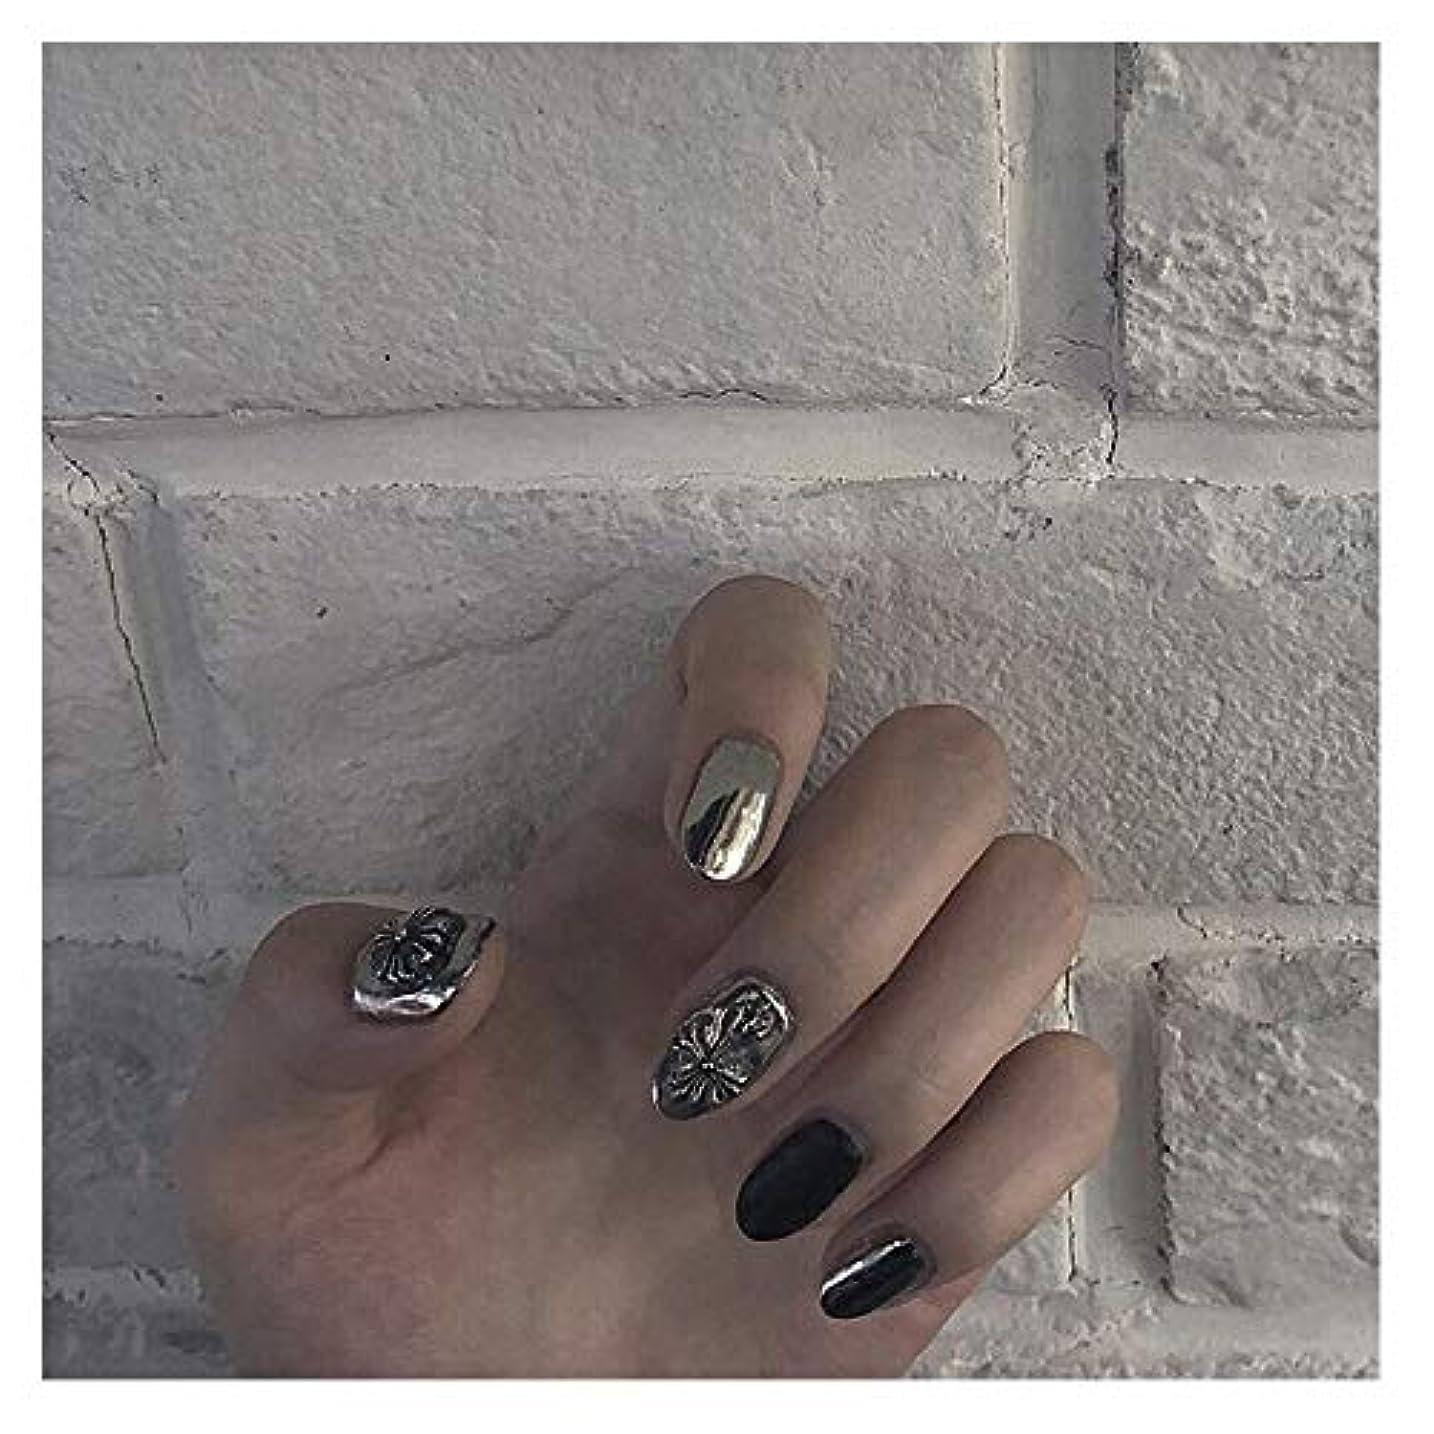 BOBIDYEE シルバークロスゴススタイルグルーフェイクネイルズファッション単一製品アクセサリーラウンドネイルズ光沢のあるシルバー+ブラック (色 : 24 pieces)